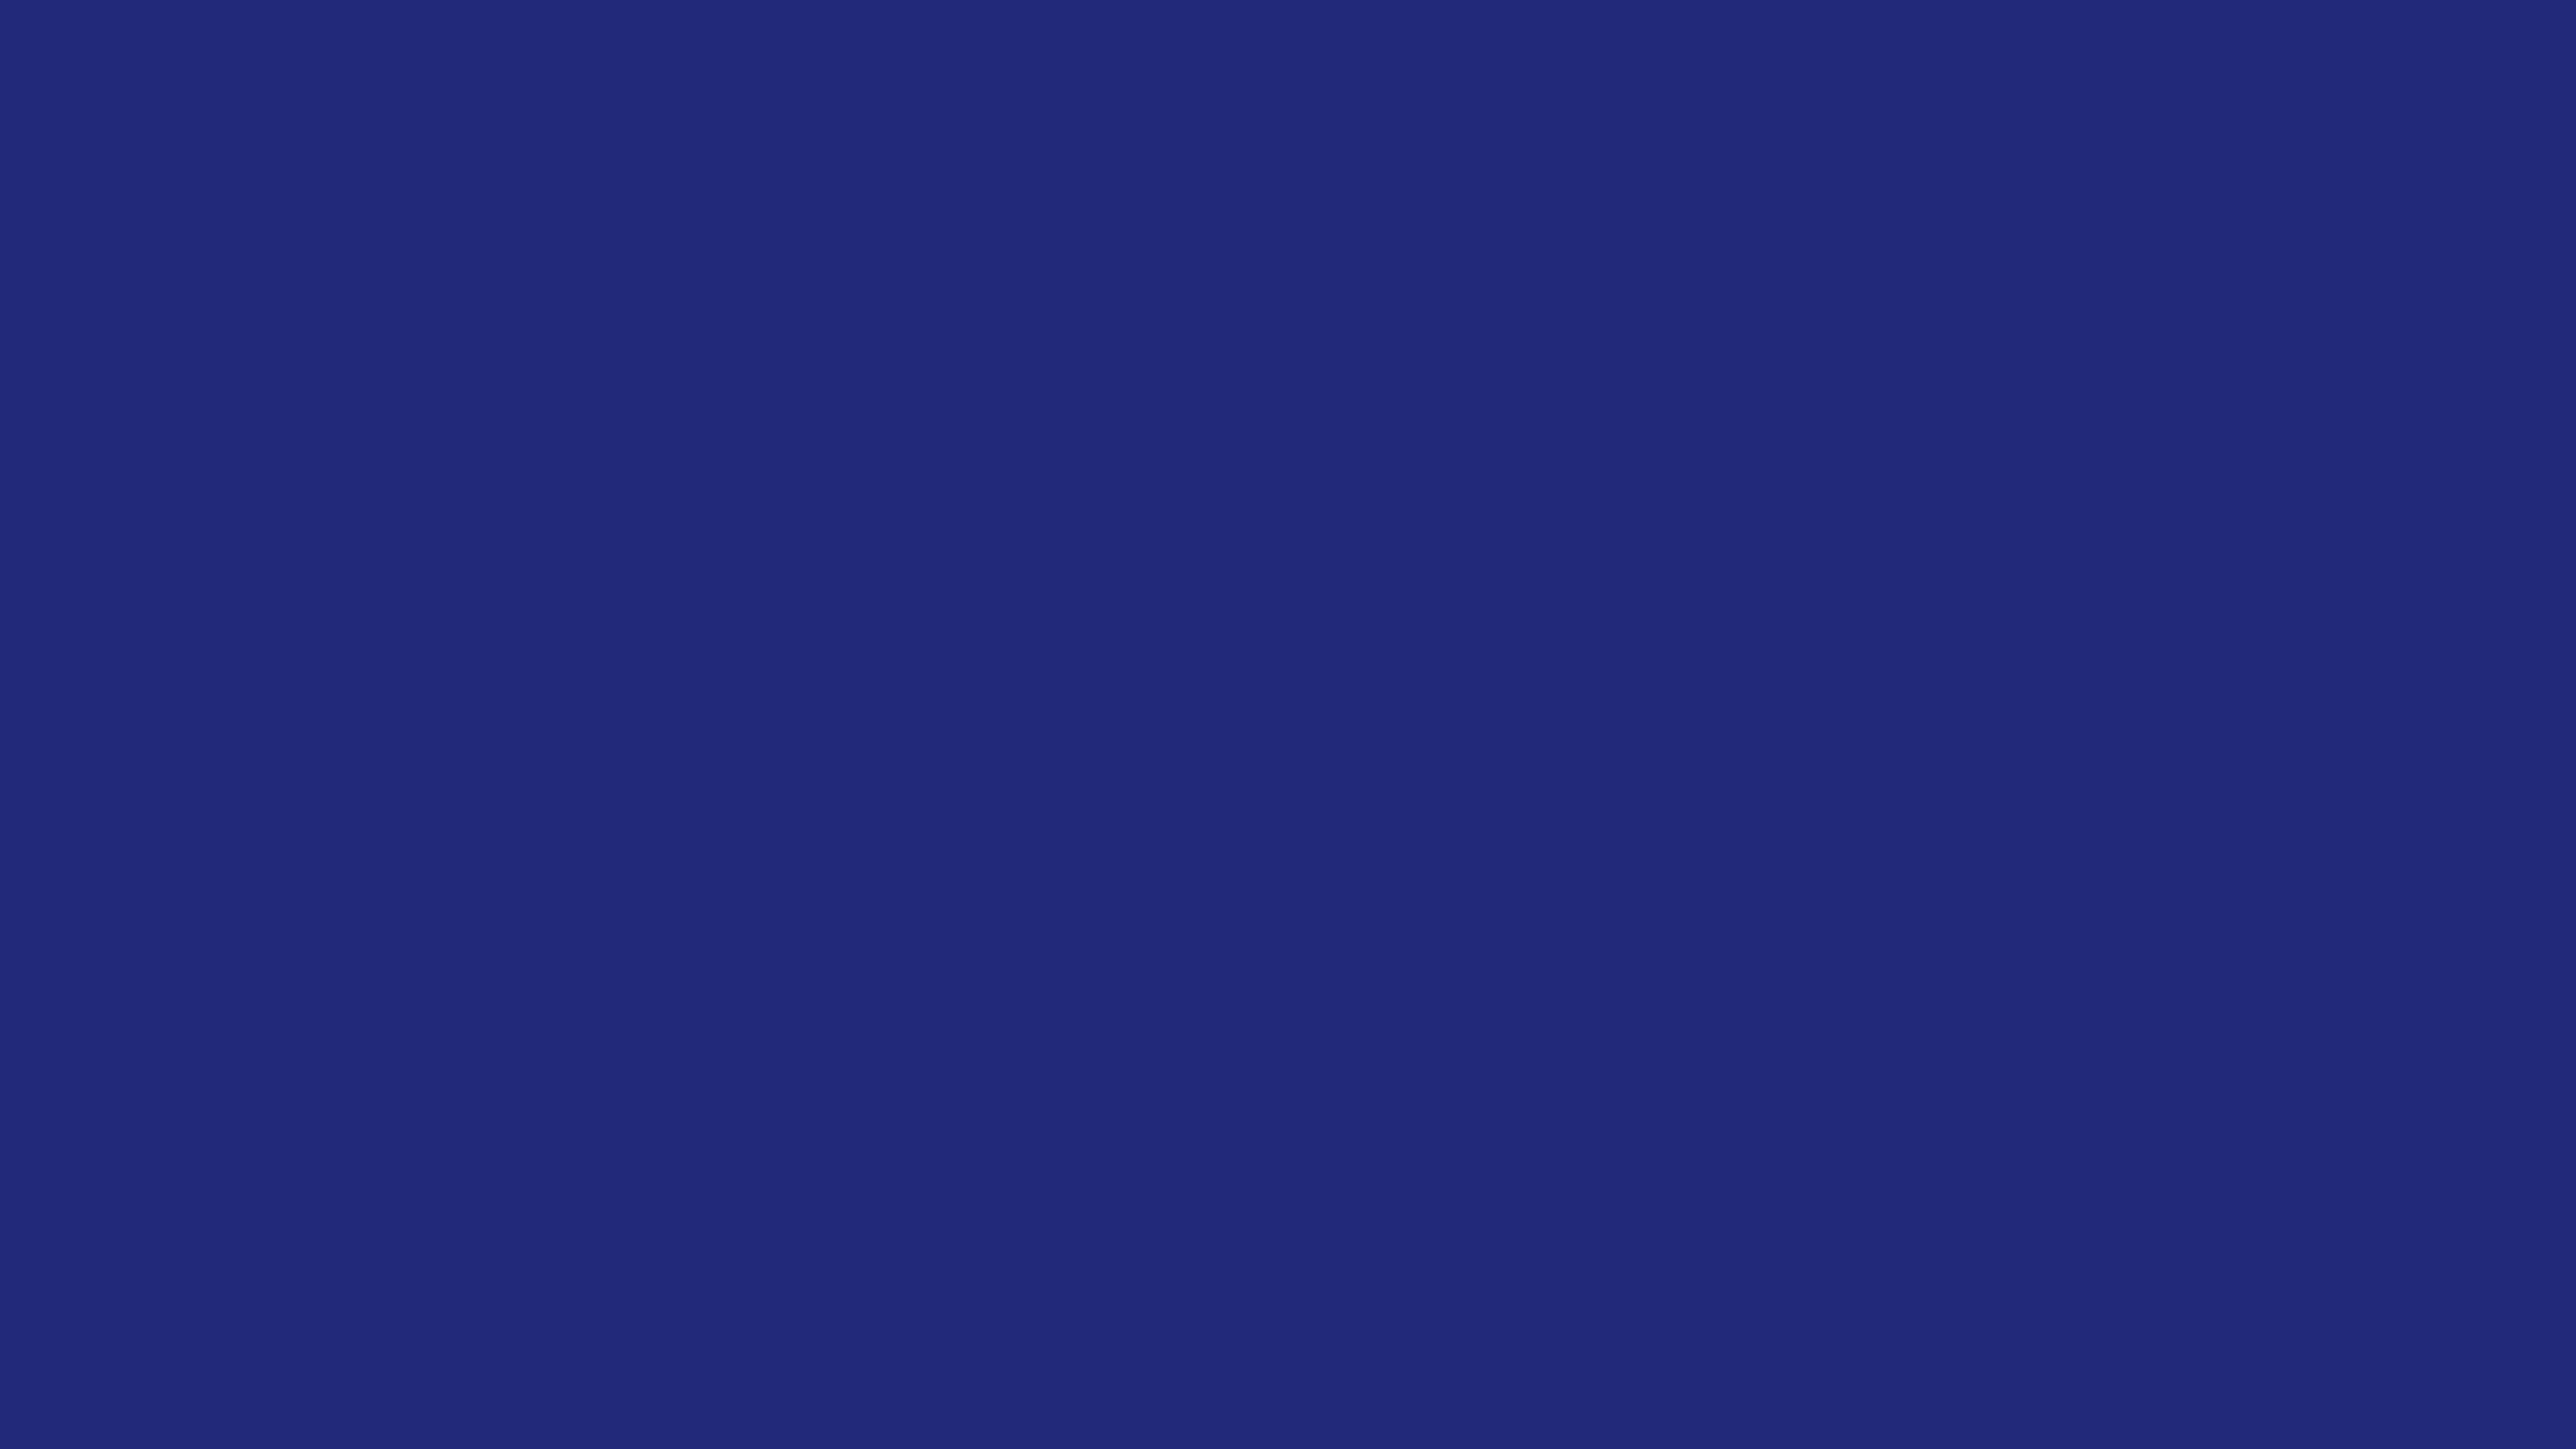 5120x2880 St Patricks Blue Solid Color Background